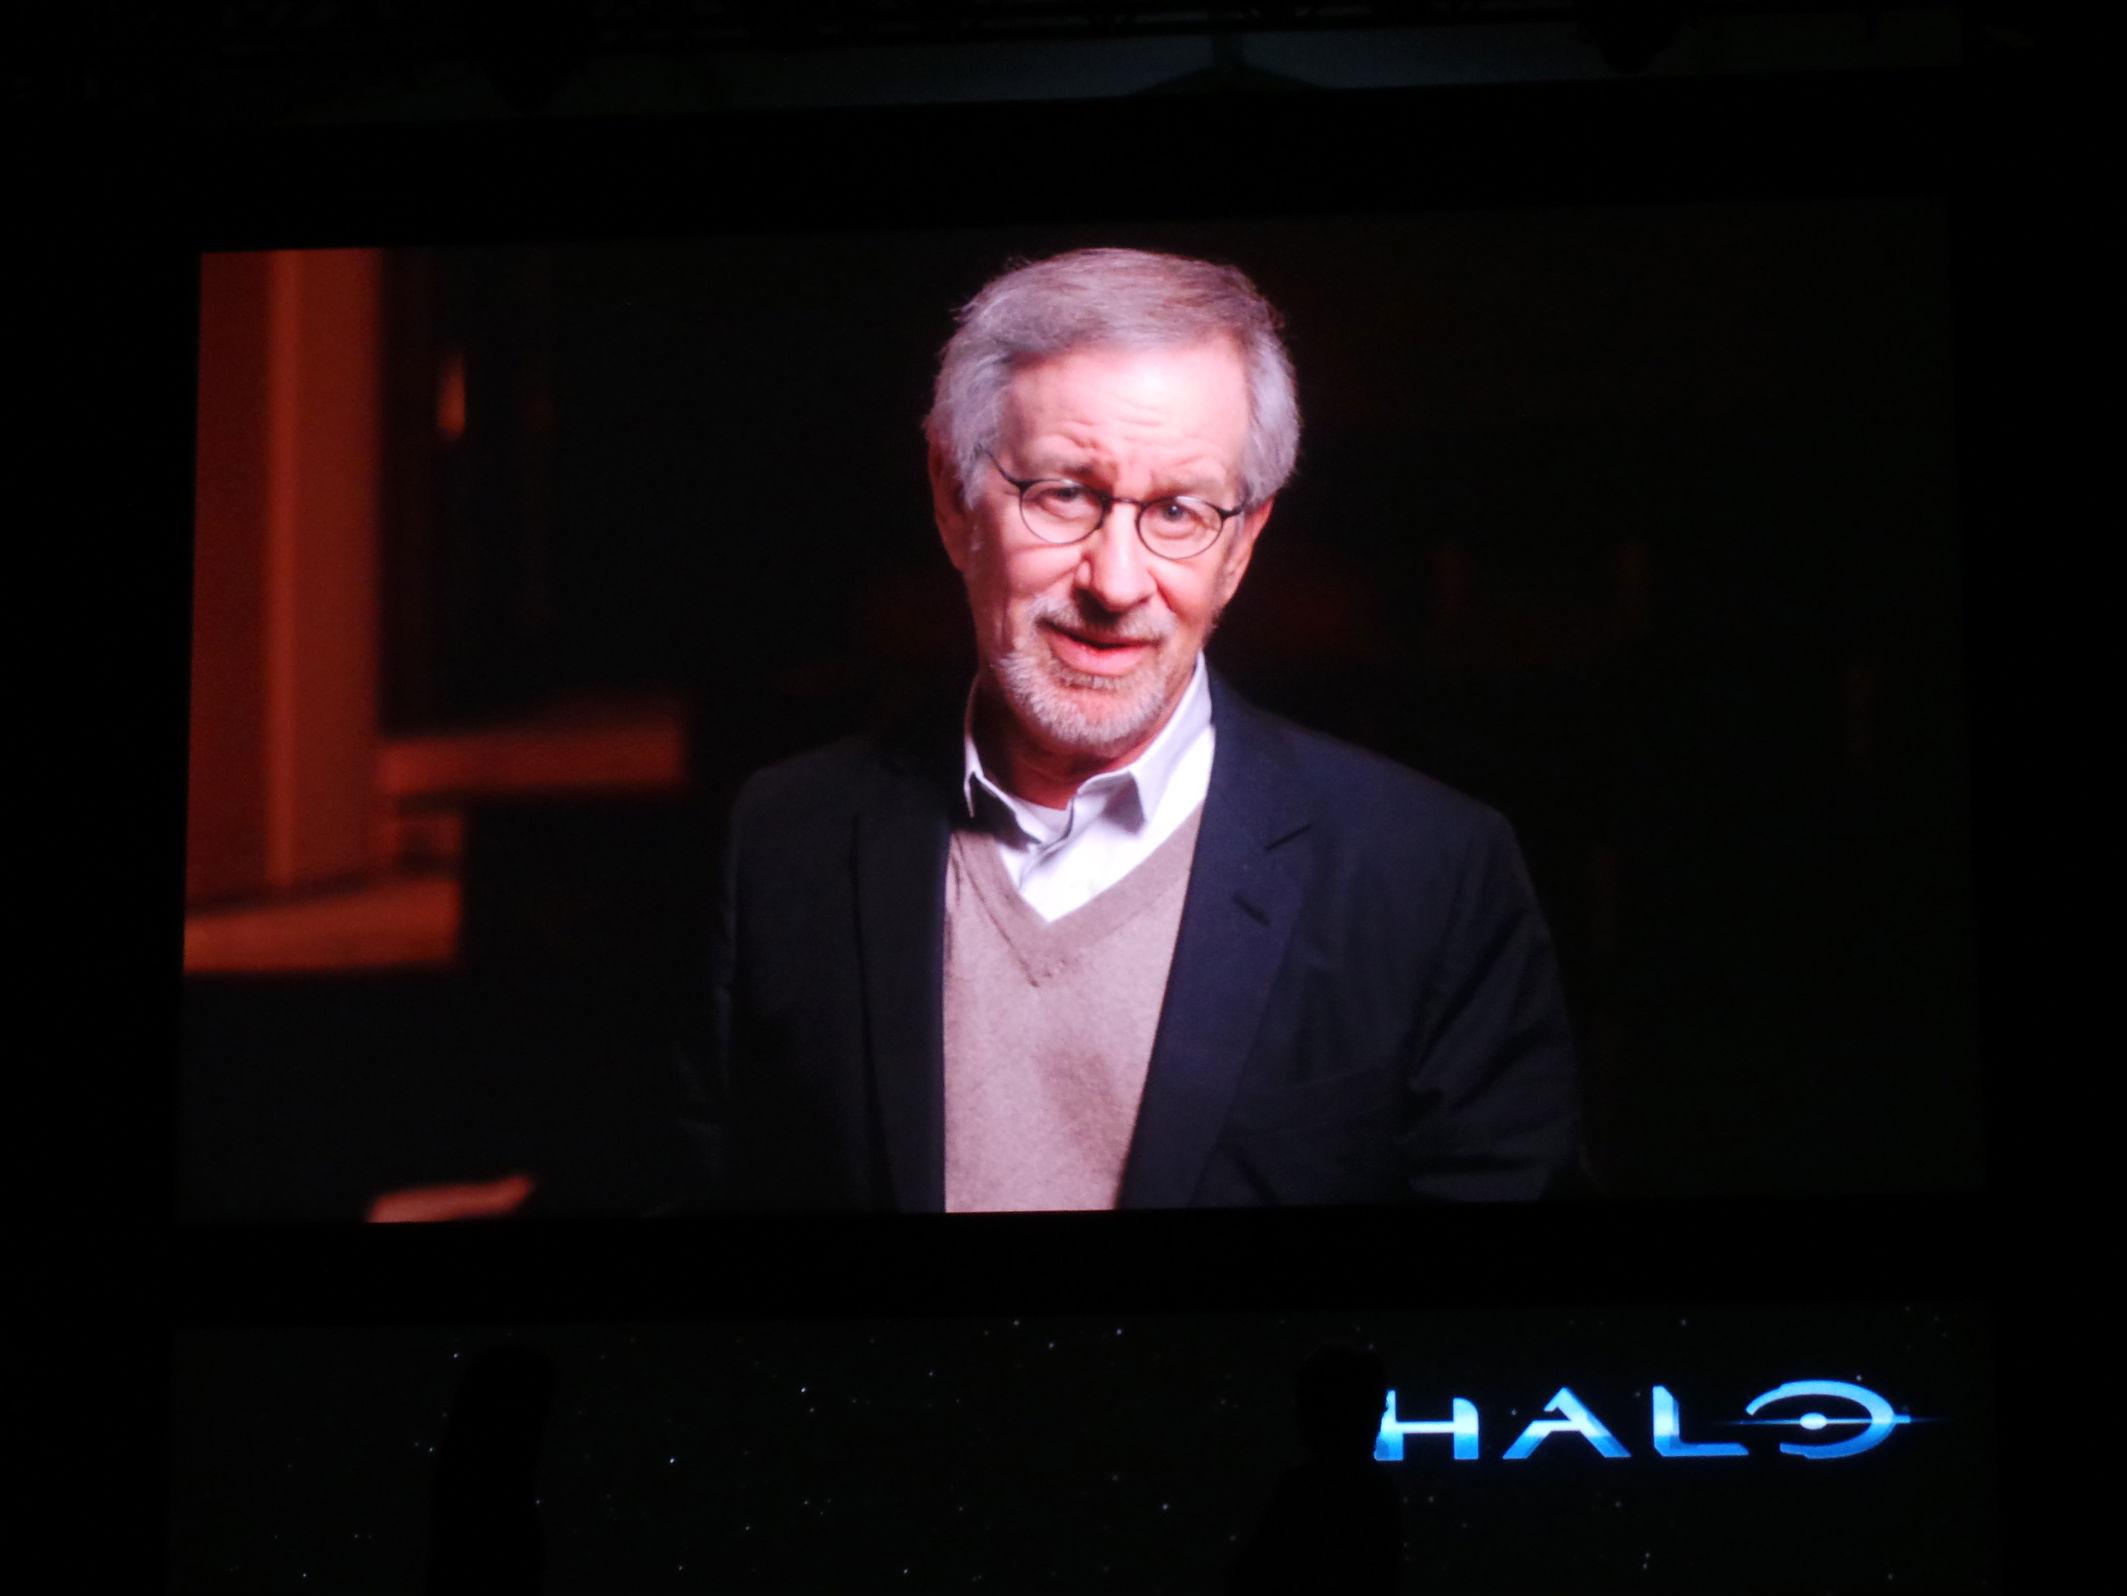 Halo TV Show